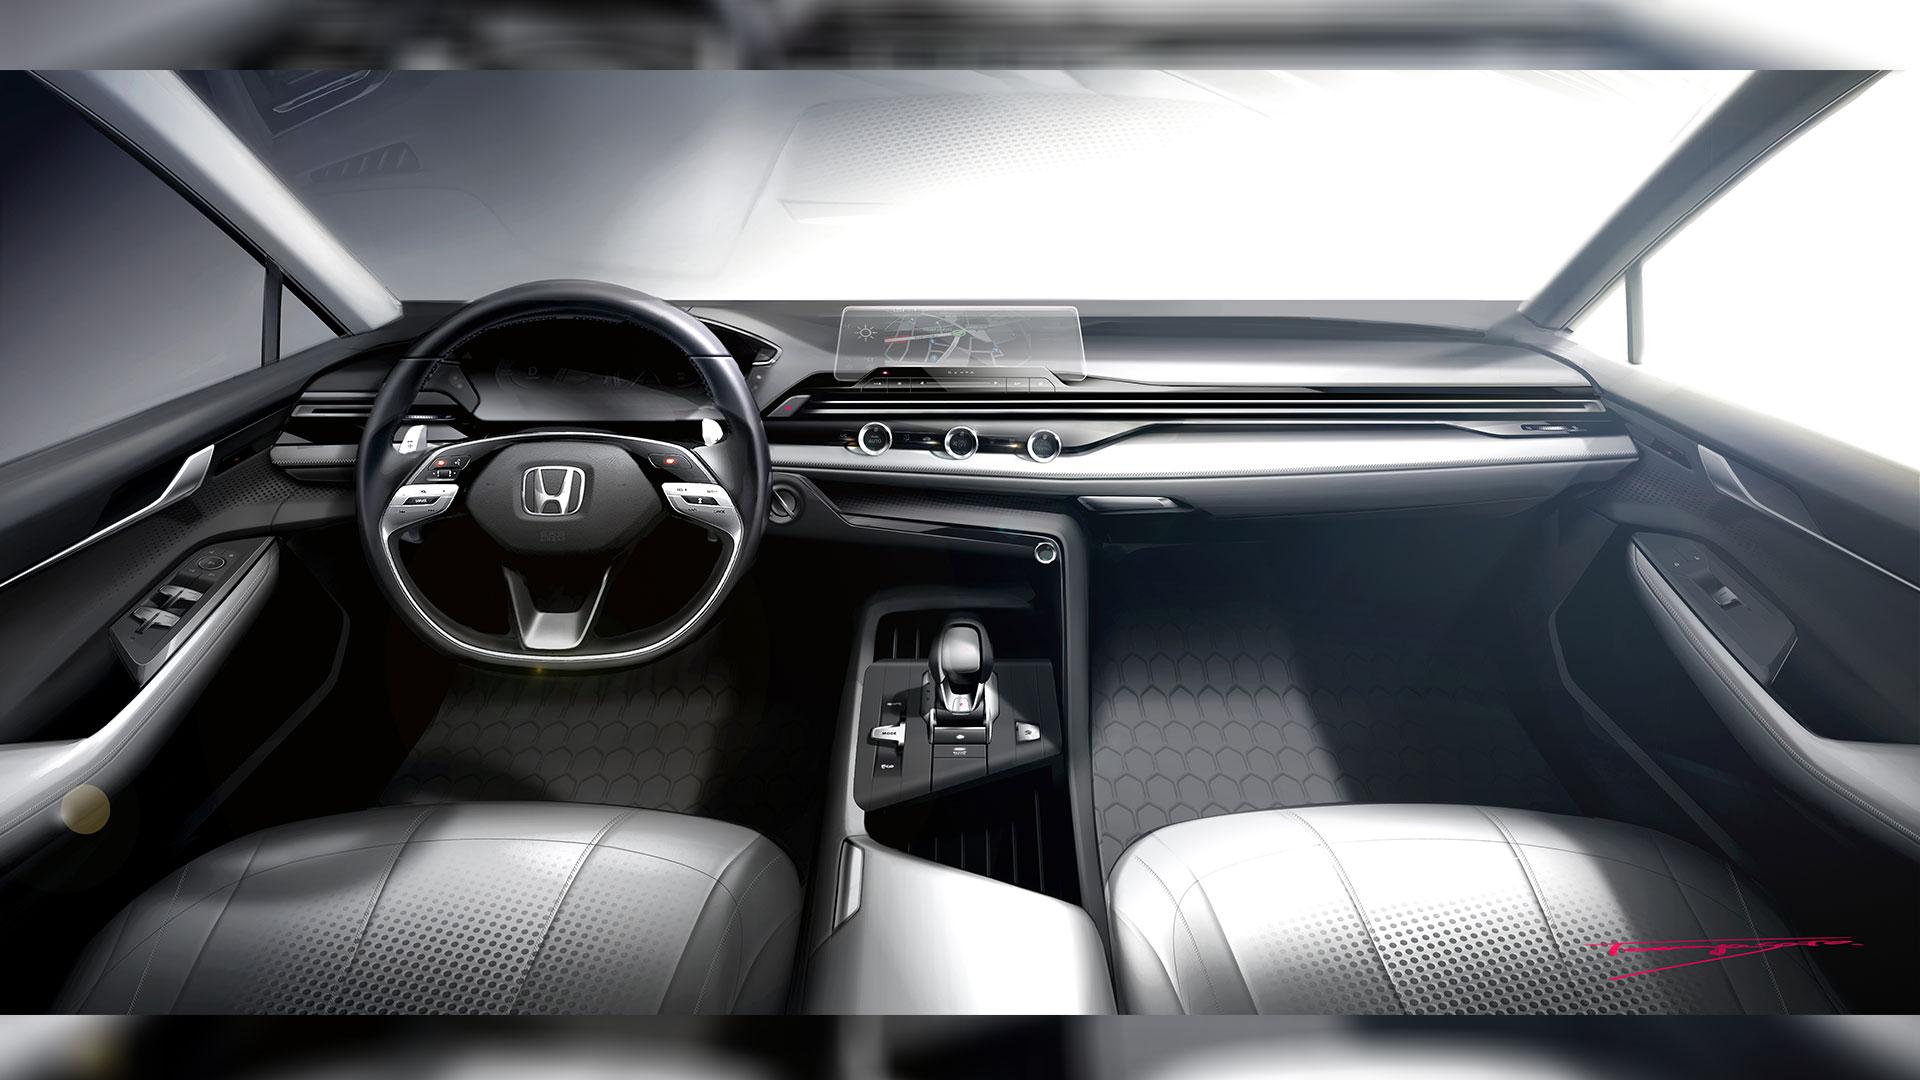 Honda previews next-gen interior design language